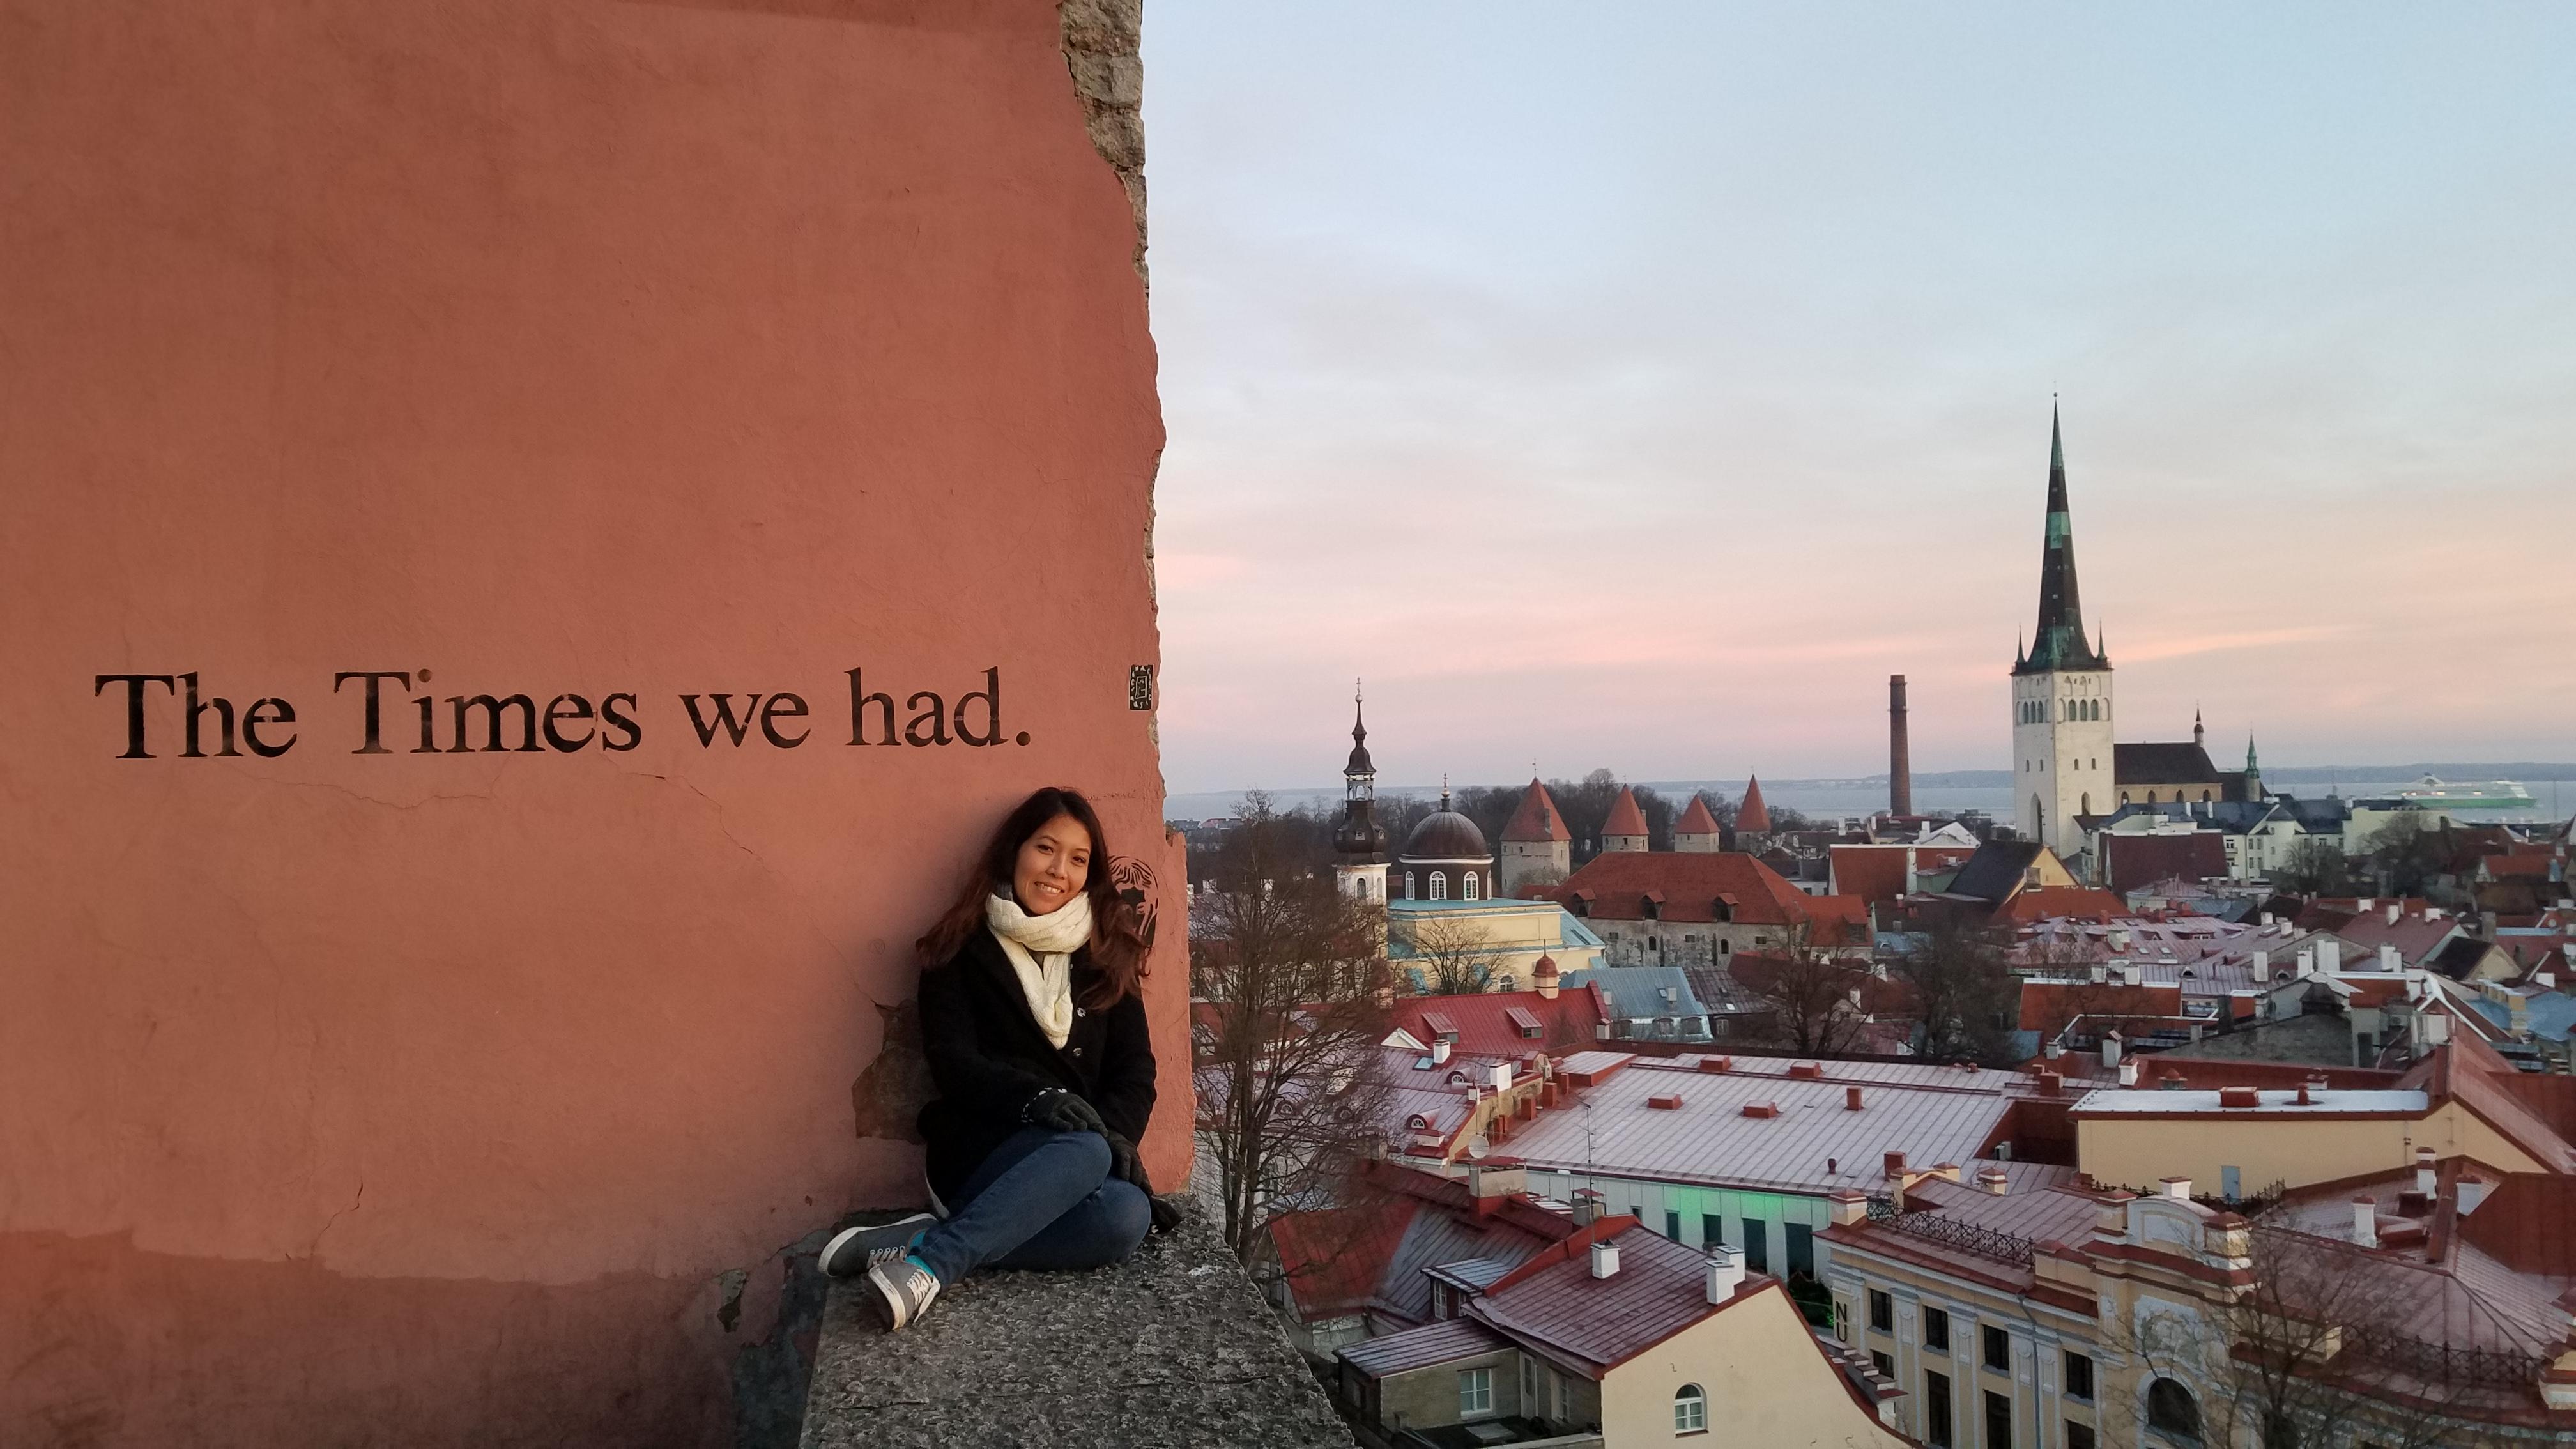 2 Days in Tallinn, Estonia